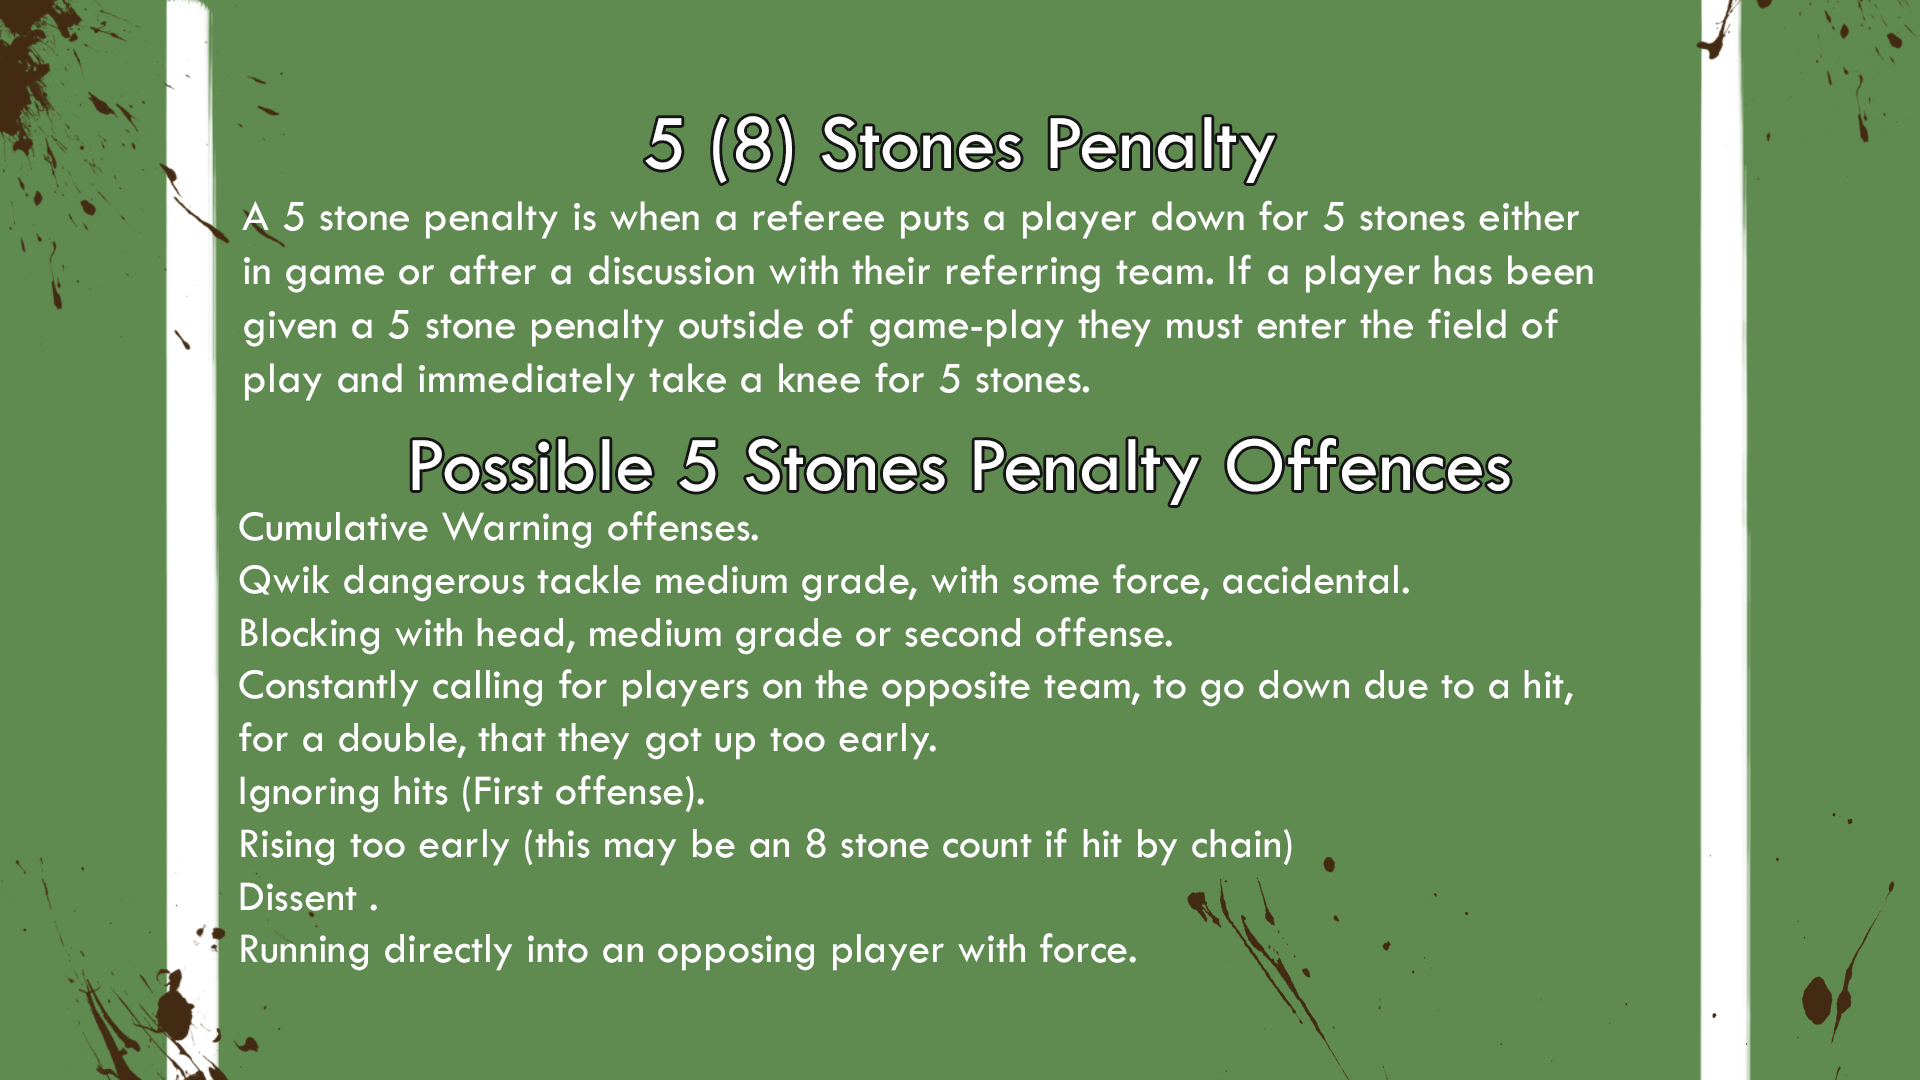 5 (8) Stone Penalty